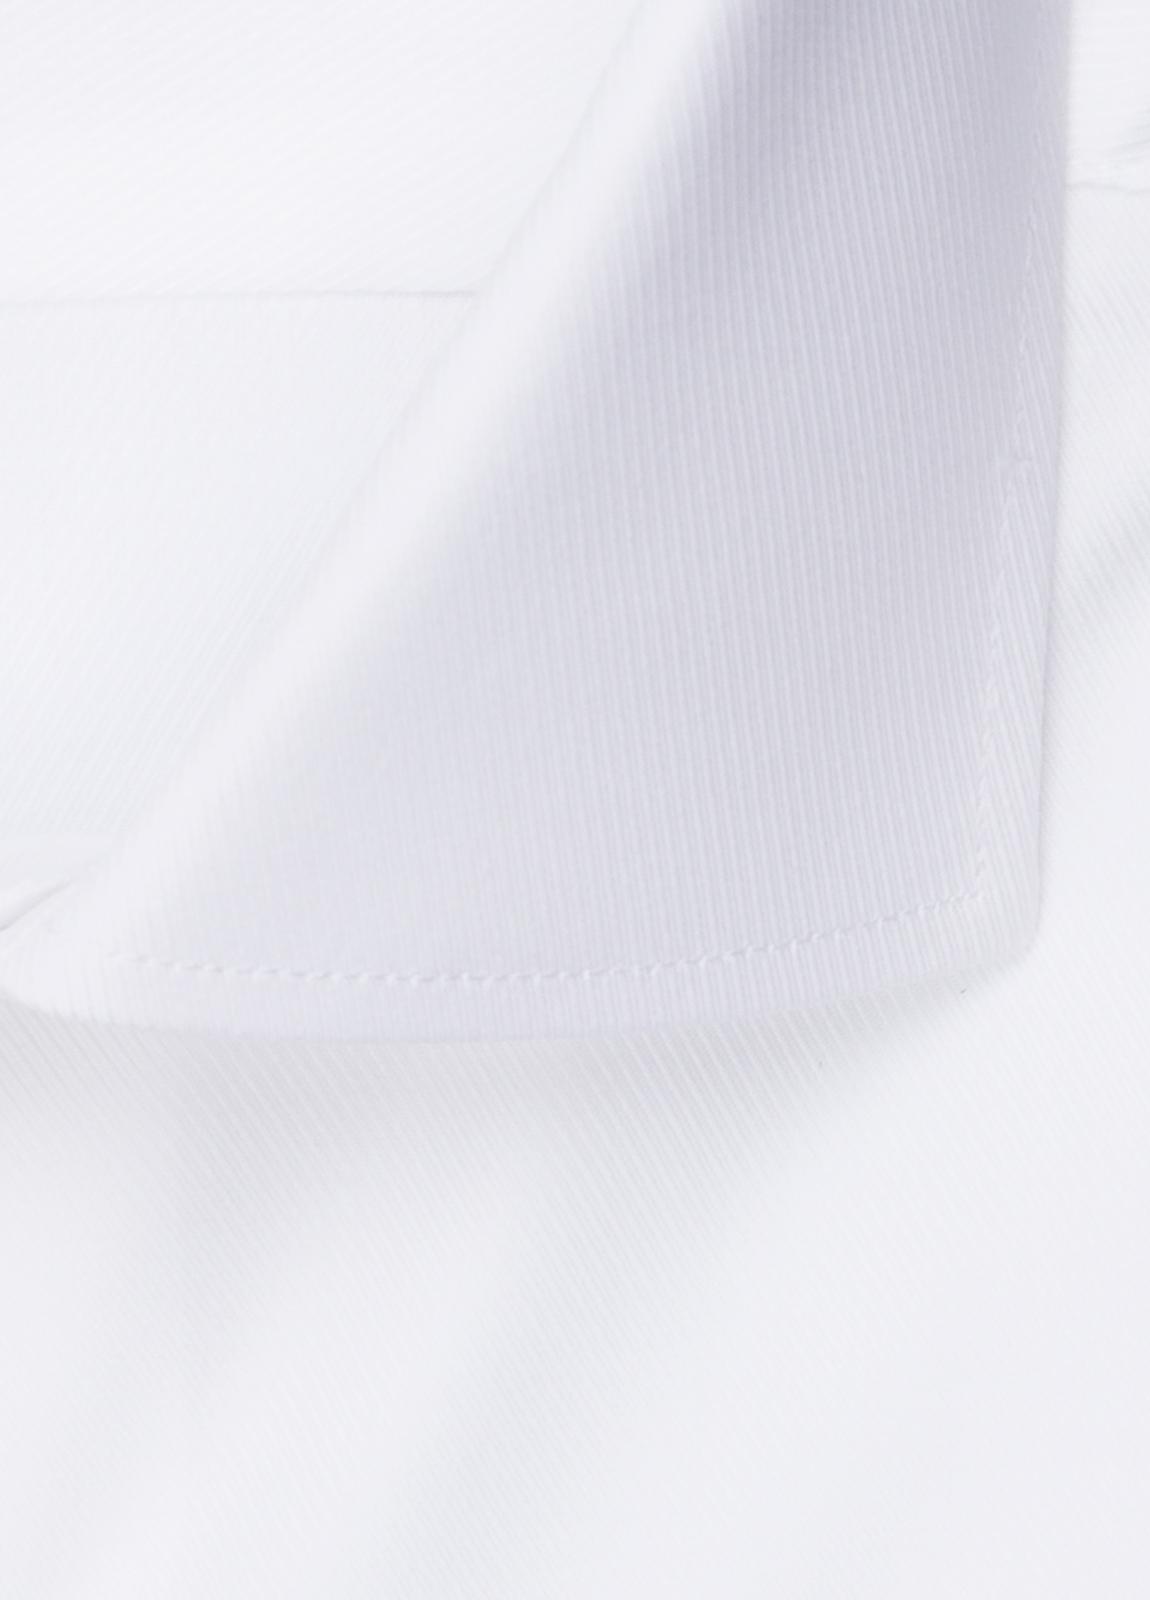 Camisa vestir FUREST COLECCIÓN Slim Fit Puño Doble otoman blanco - Ítem2